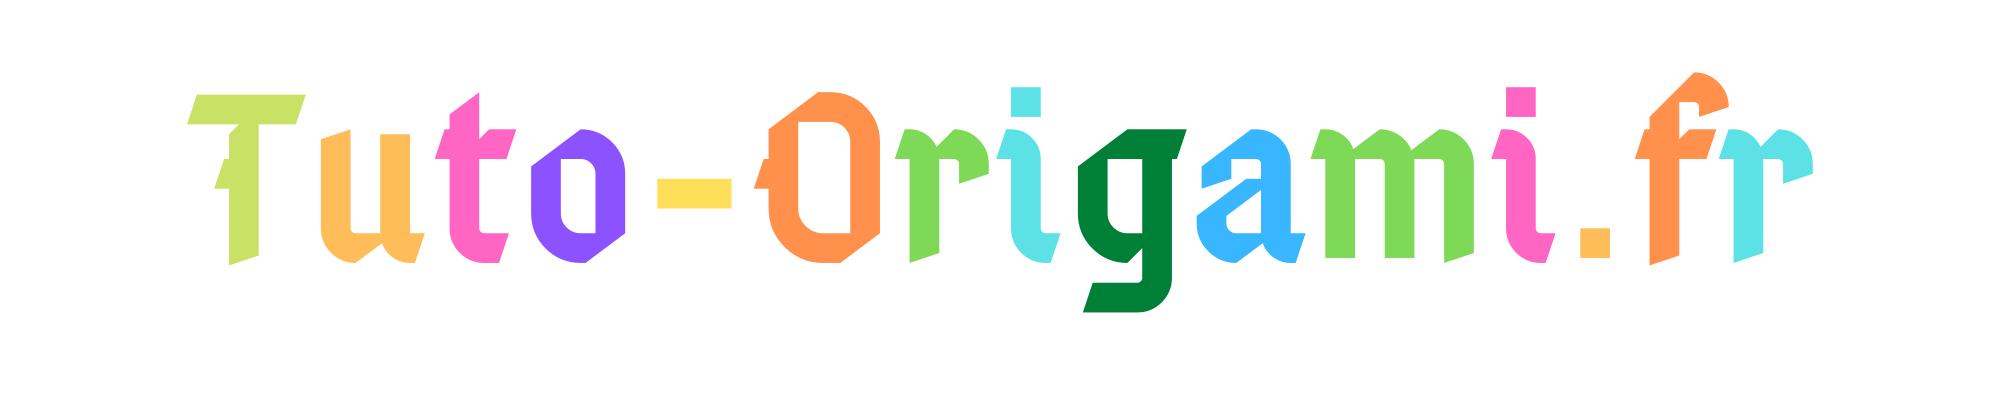 Tuto-Origami.fr | Tutoriels D'Origami Gratuit